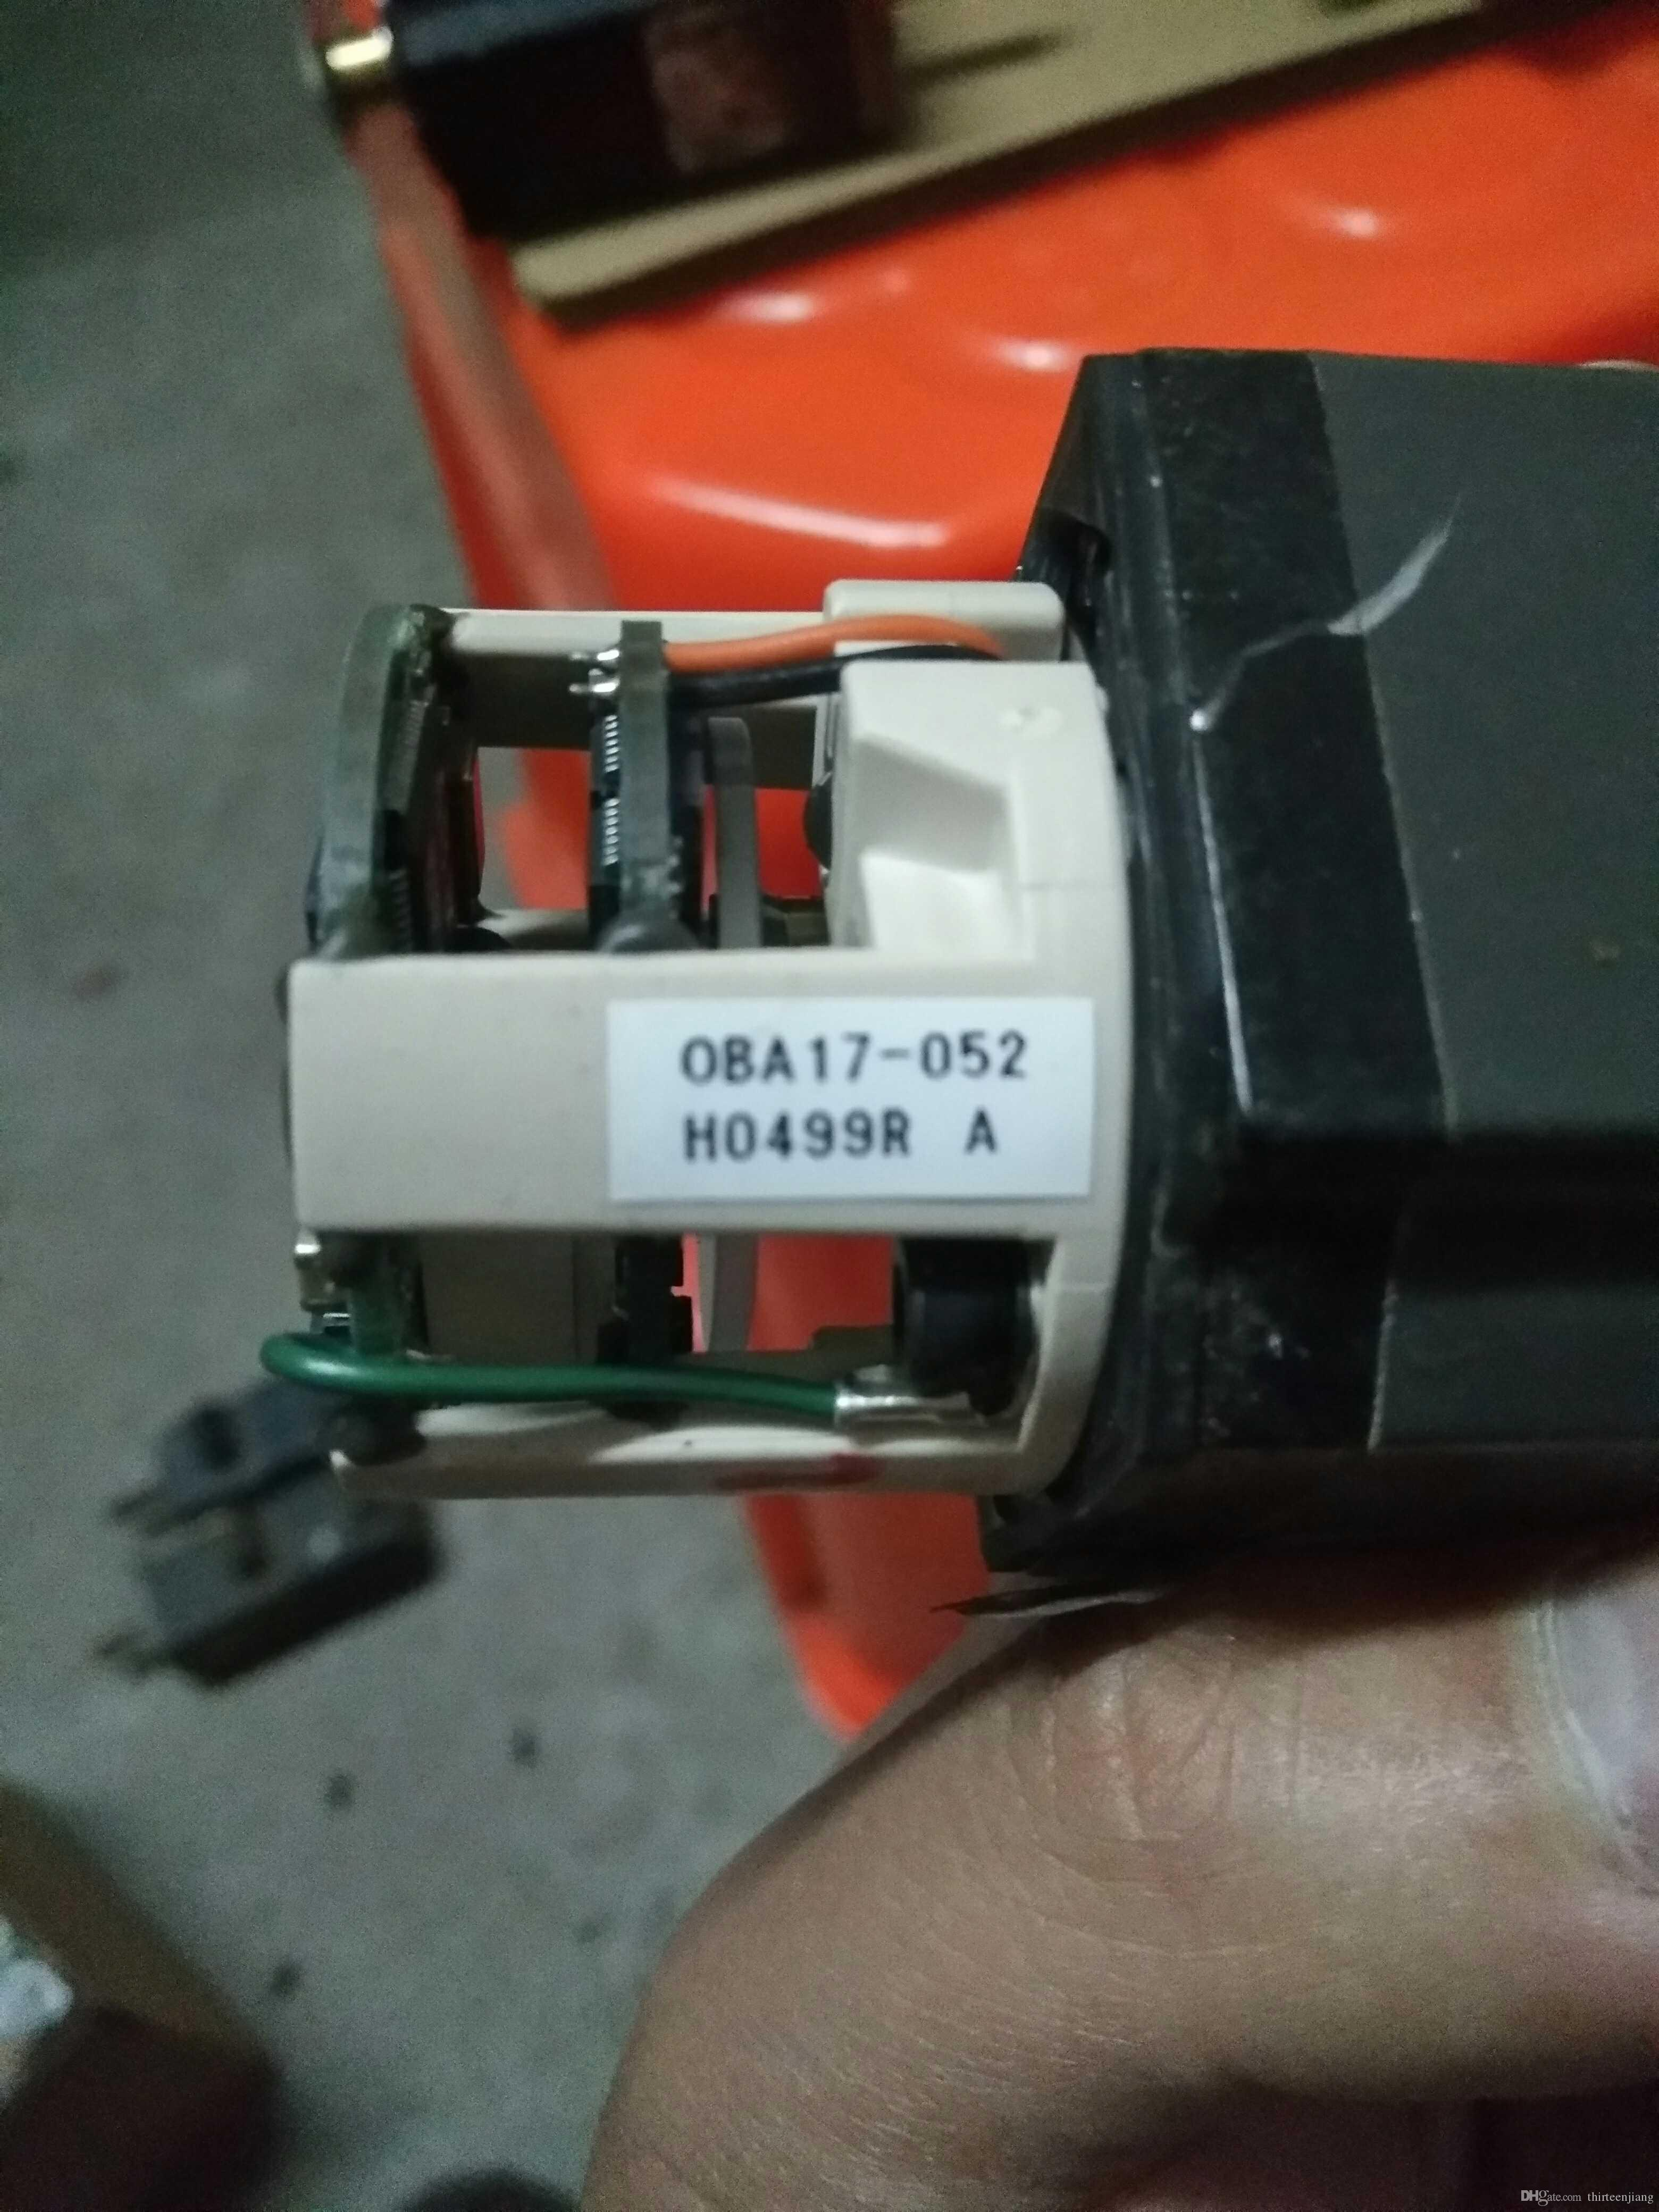 Mitsubishi encoder OBA17-052 FREE EXPEDITED SHIPPING OBA17052 NEW